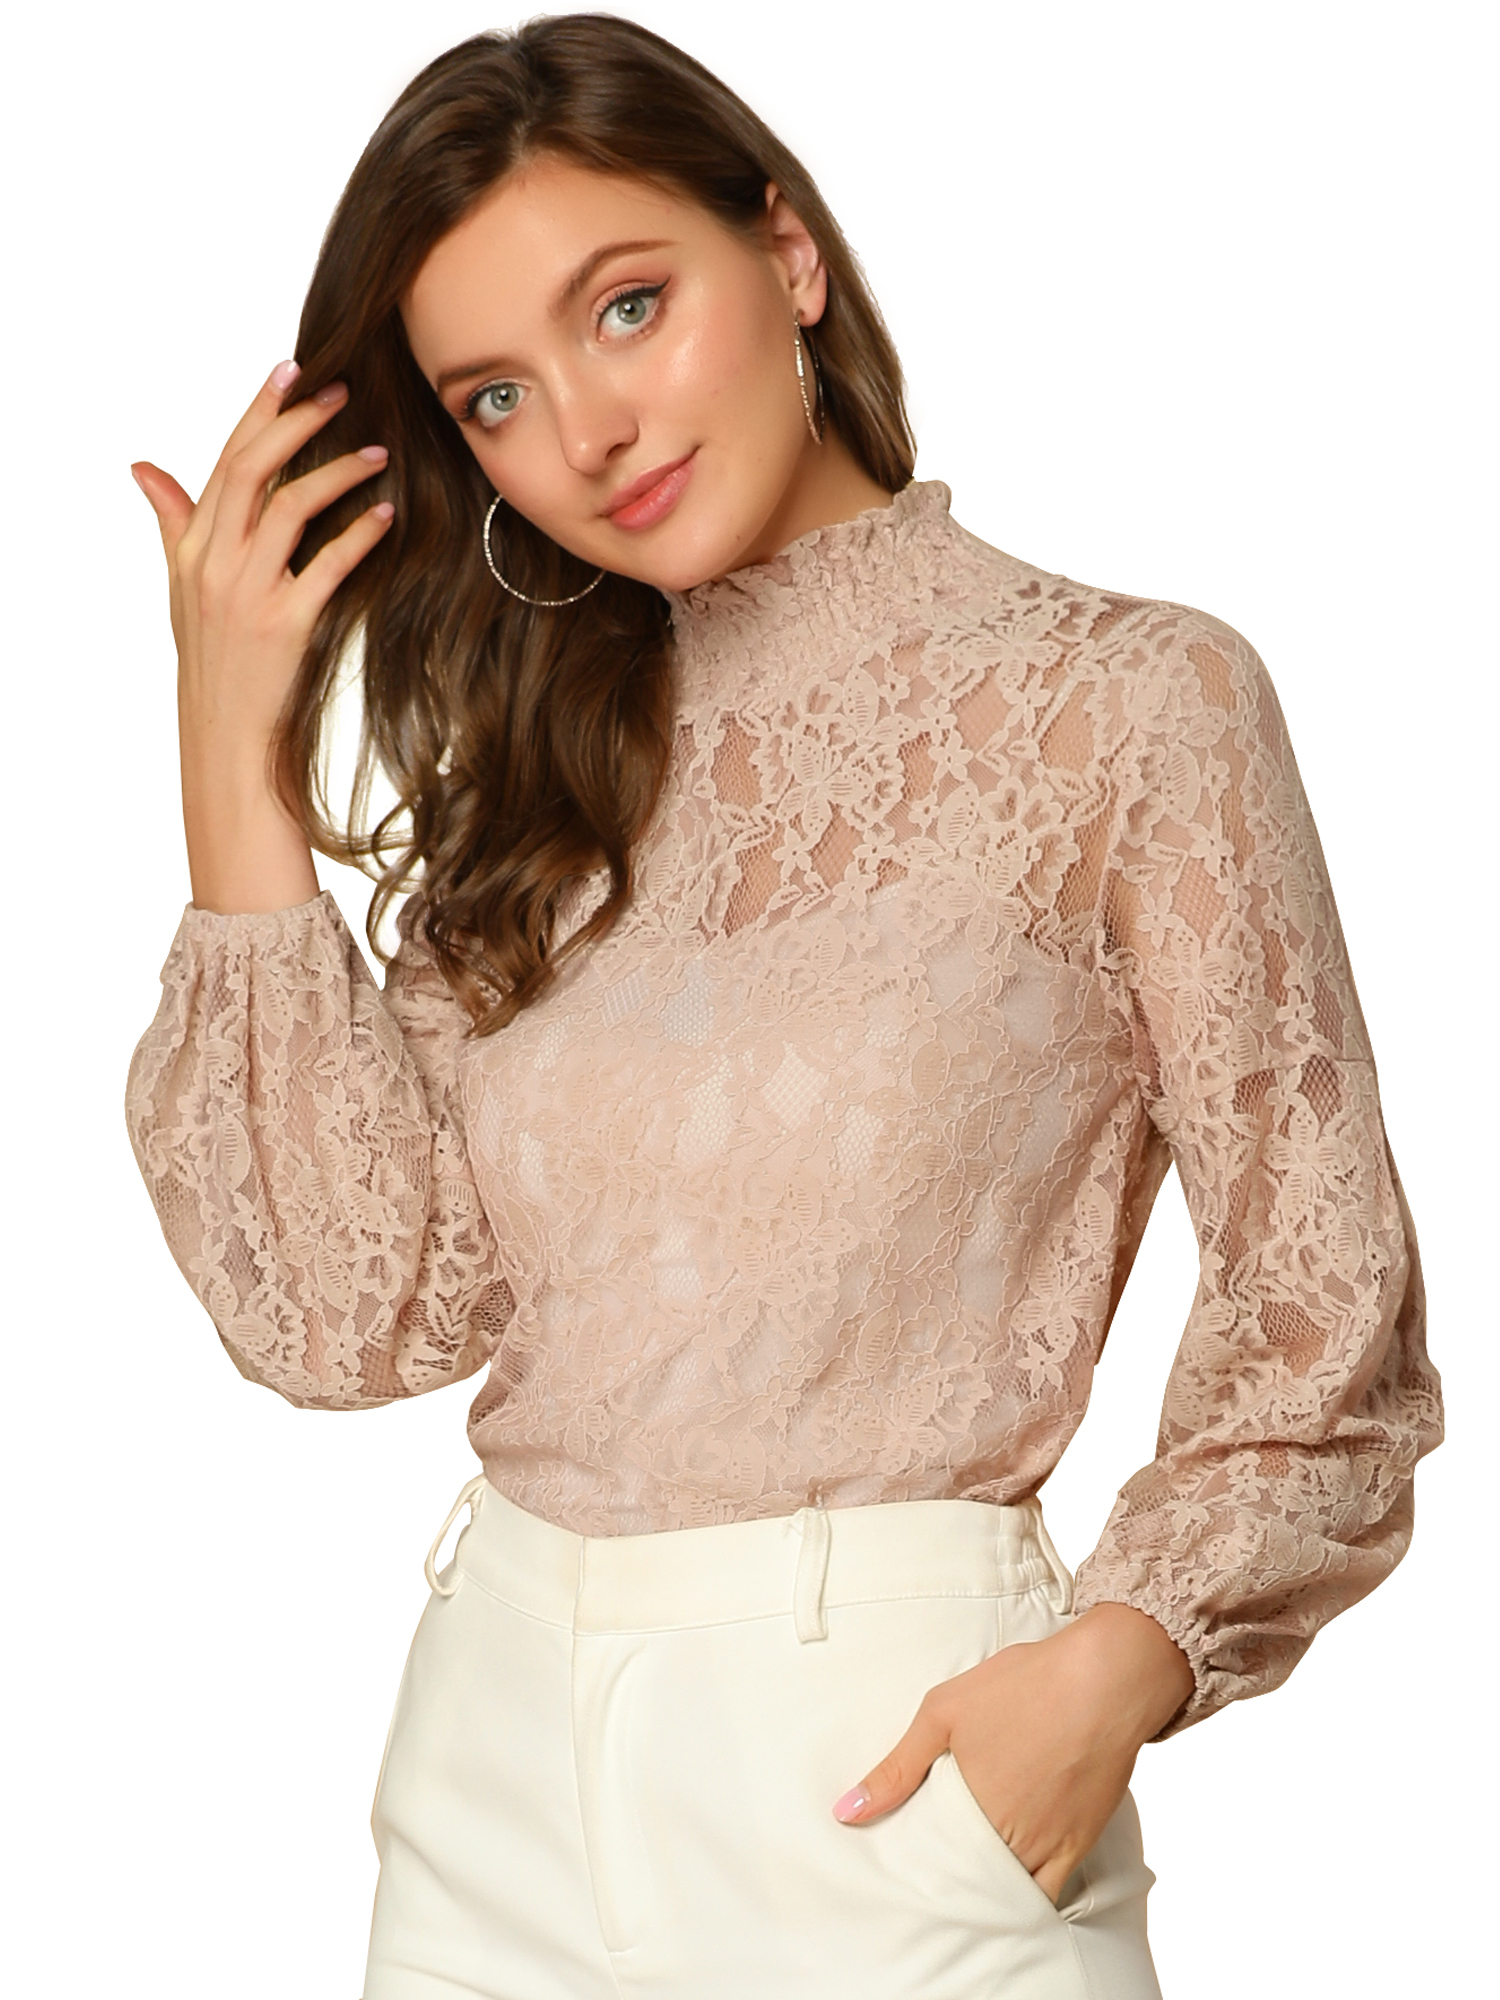 Allegra K Women's Lace Sheer Long Sleeves Vintage Tops Blouse Pink S